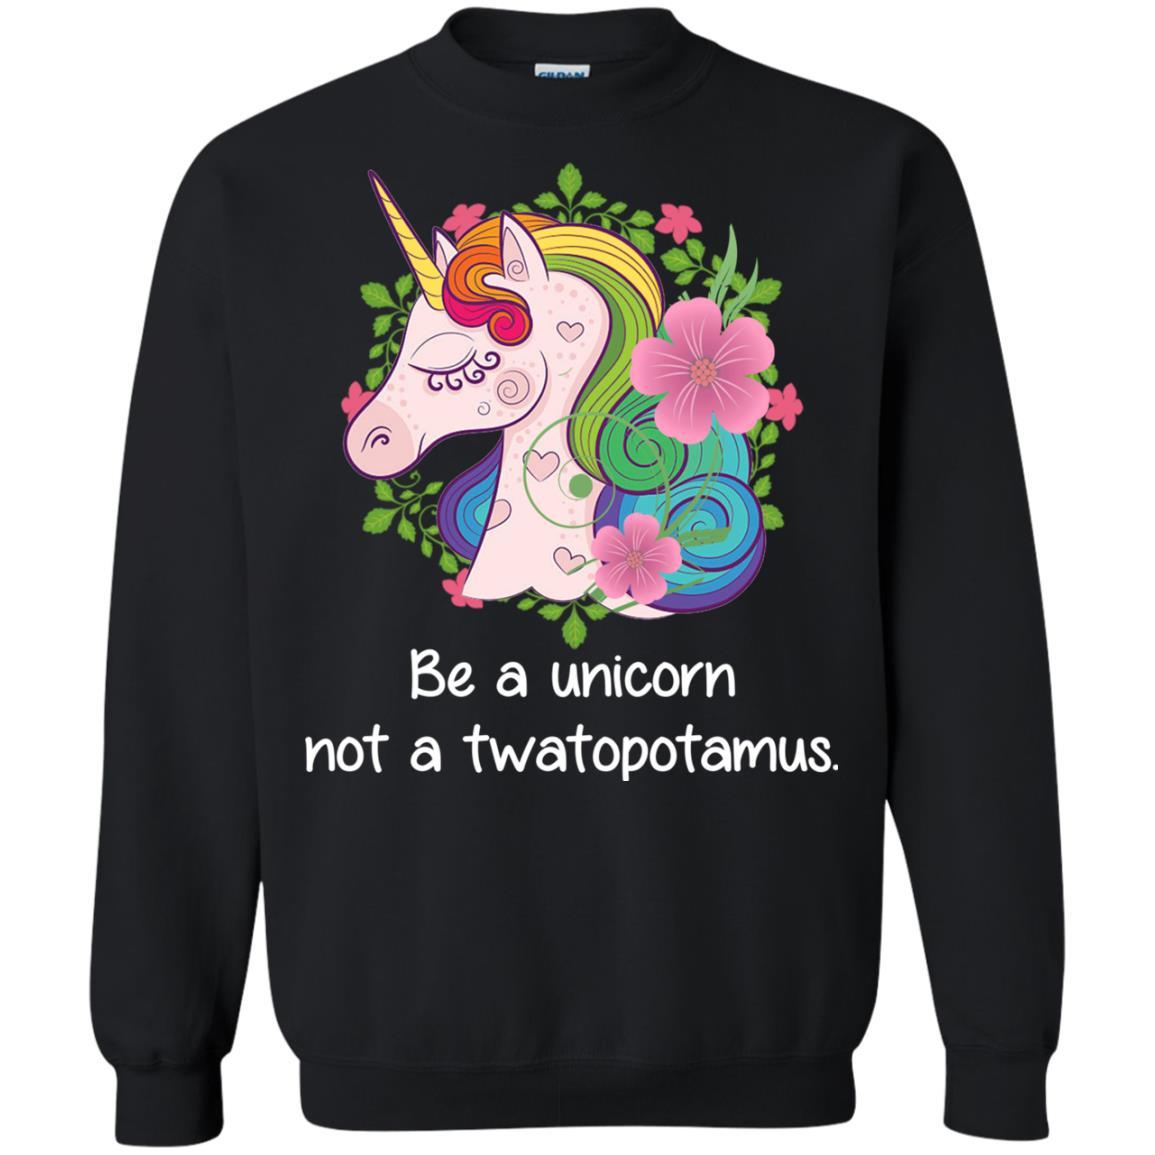 image 414 - Be a Unicorn Not a Twatopotamus Shirt, Sweatshirt, Hoodie